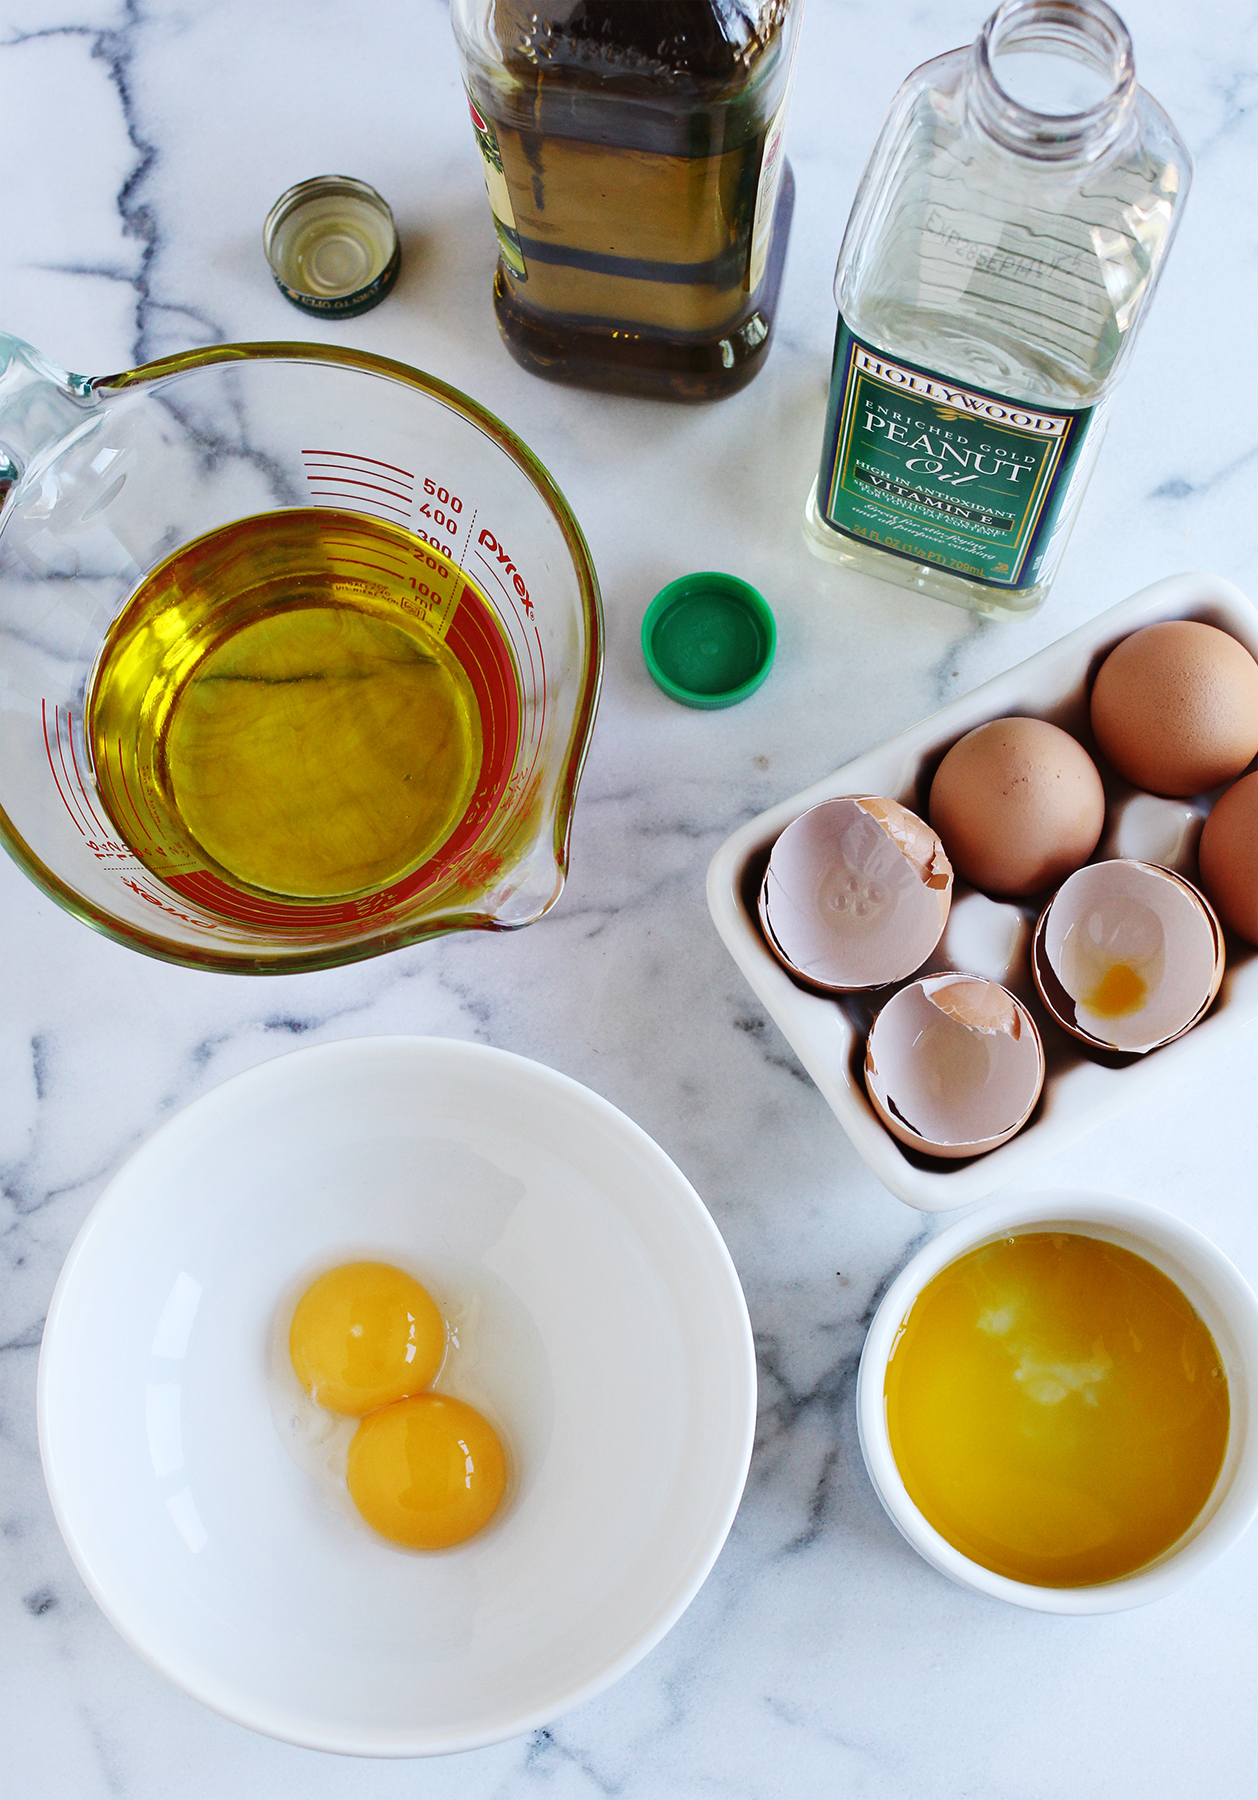 Homemade mayo recipe